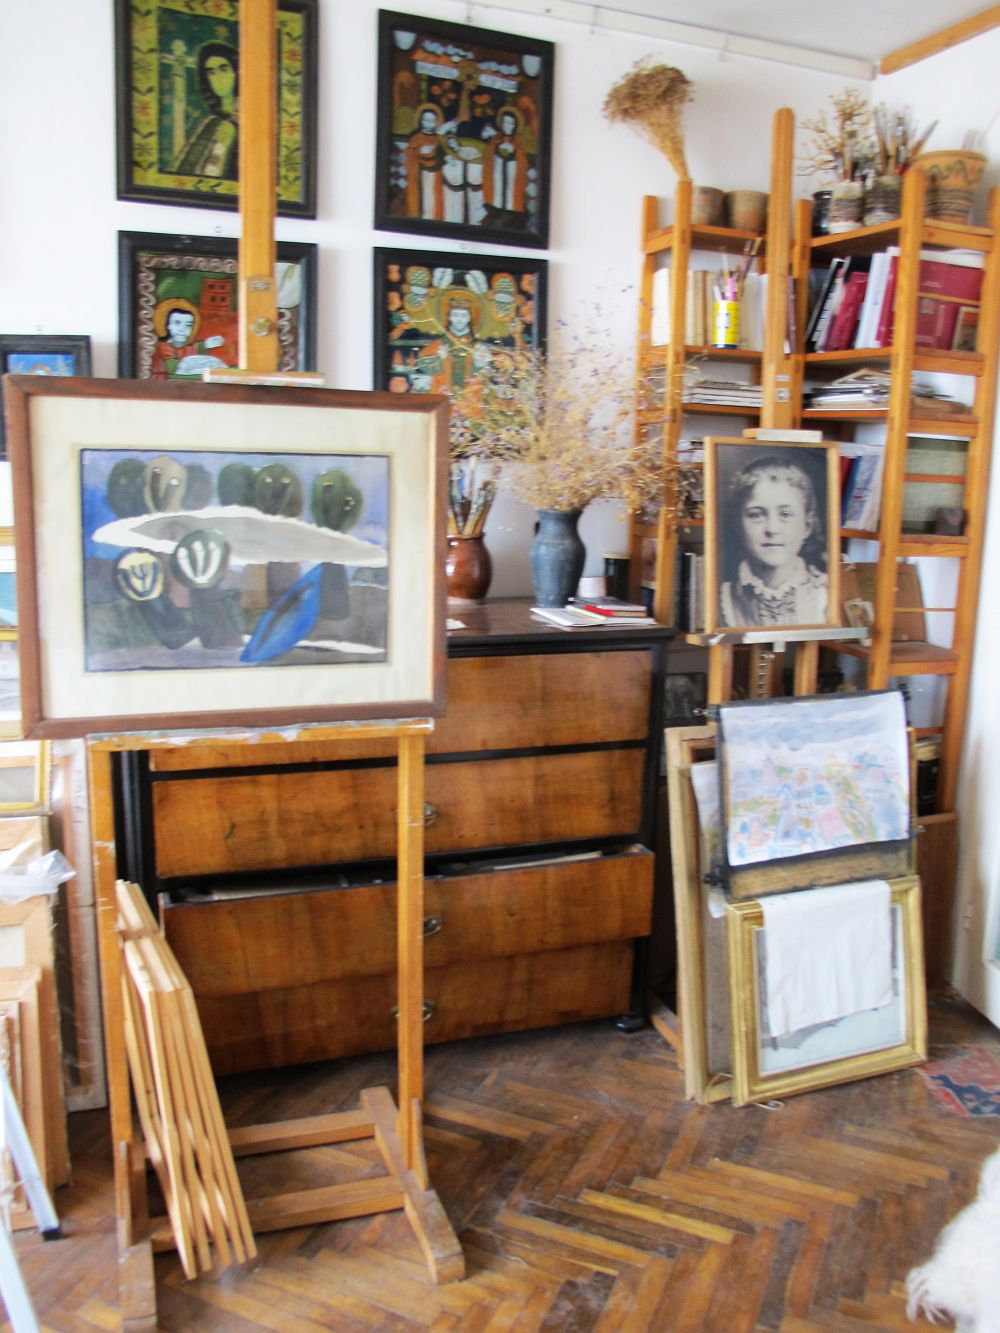 adelaparvu.com despre acuarele Mihai Macri, atelier artist Mihai si Mariana Macri (49)